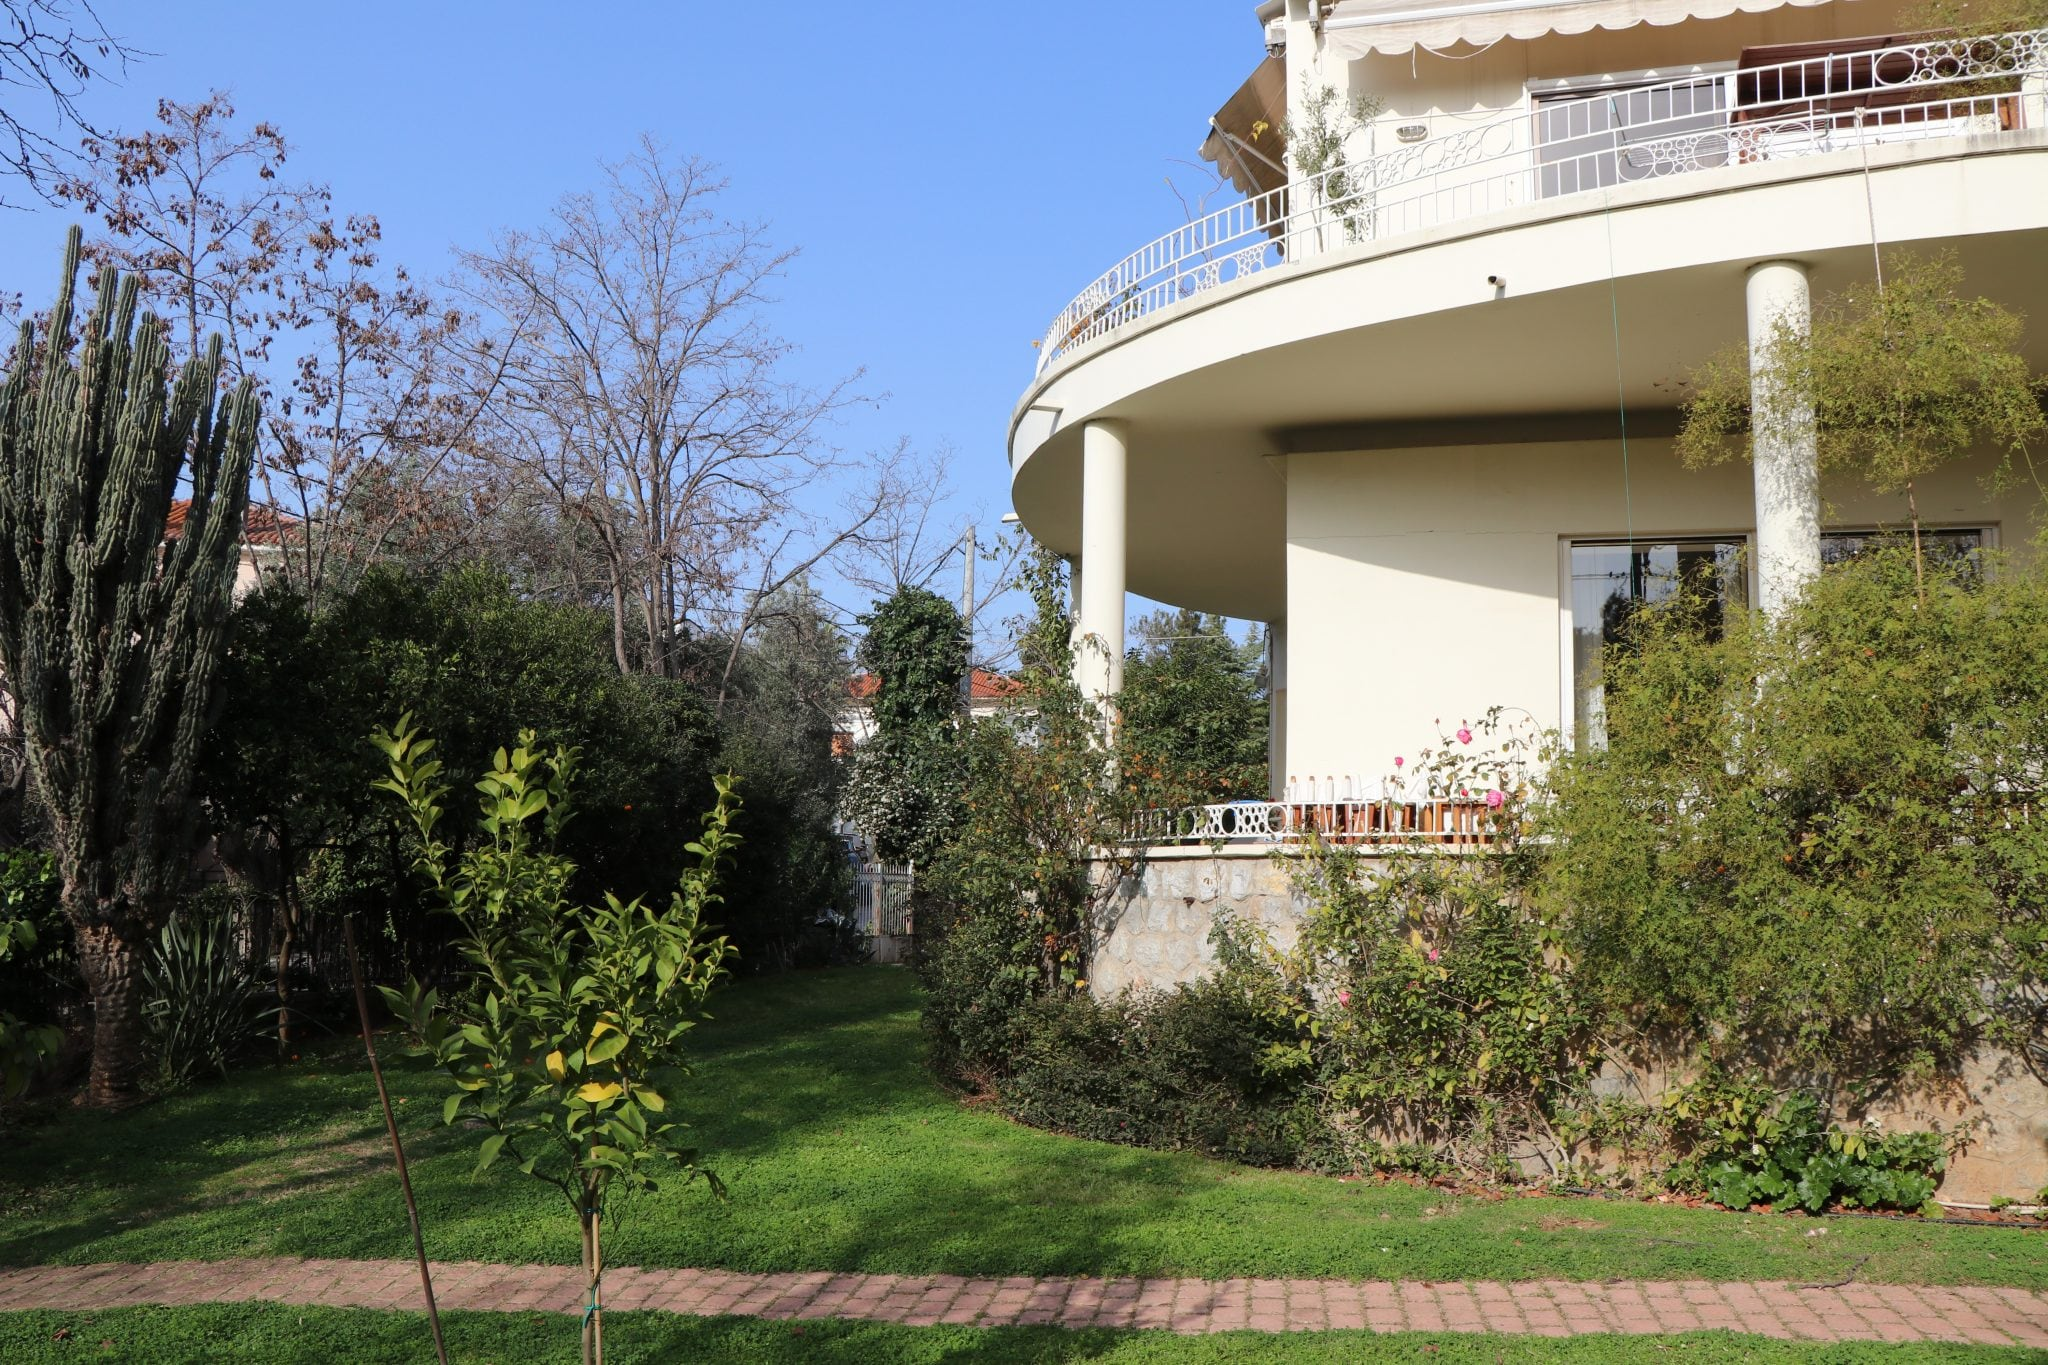 Maison, Filothei - Ref GR-4216